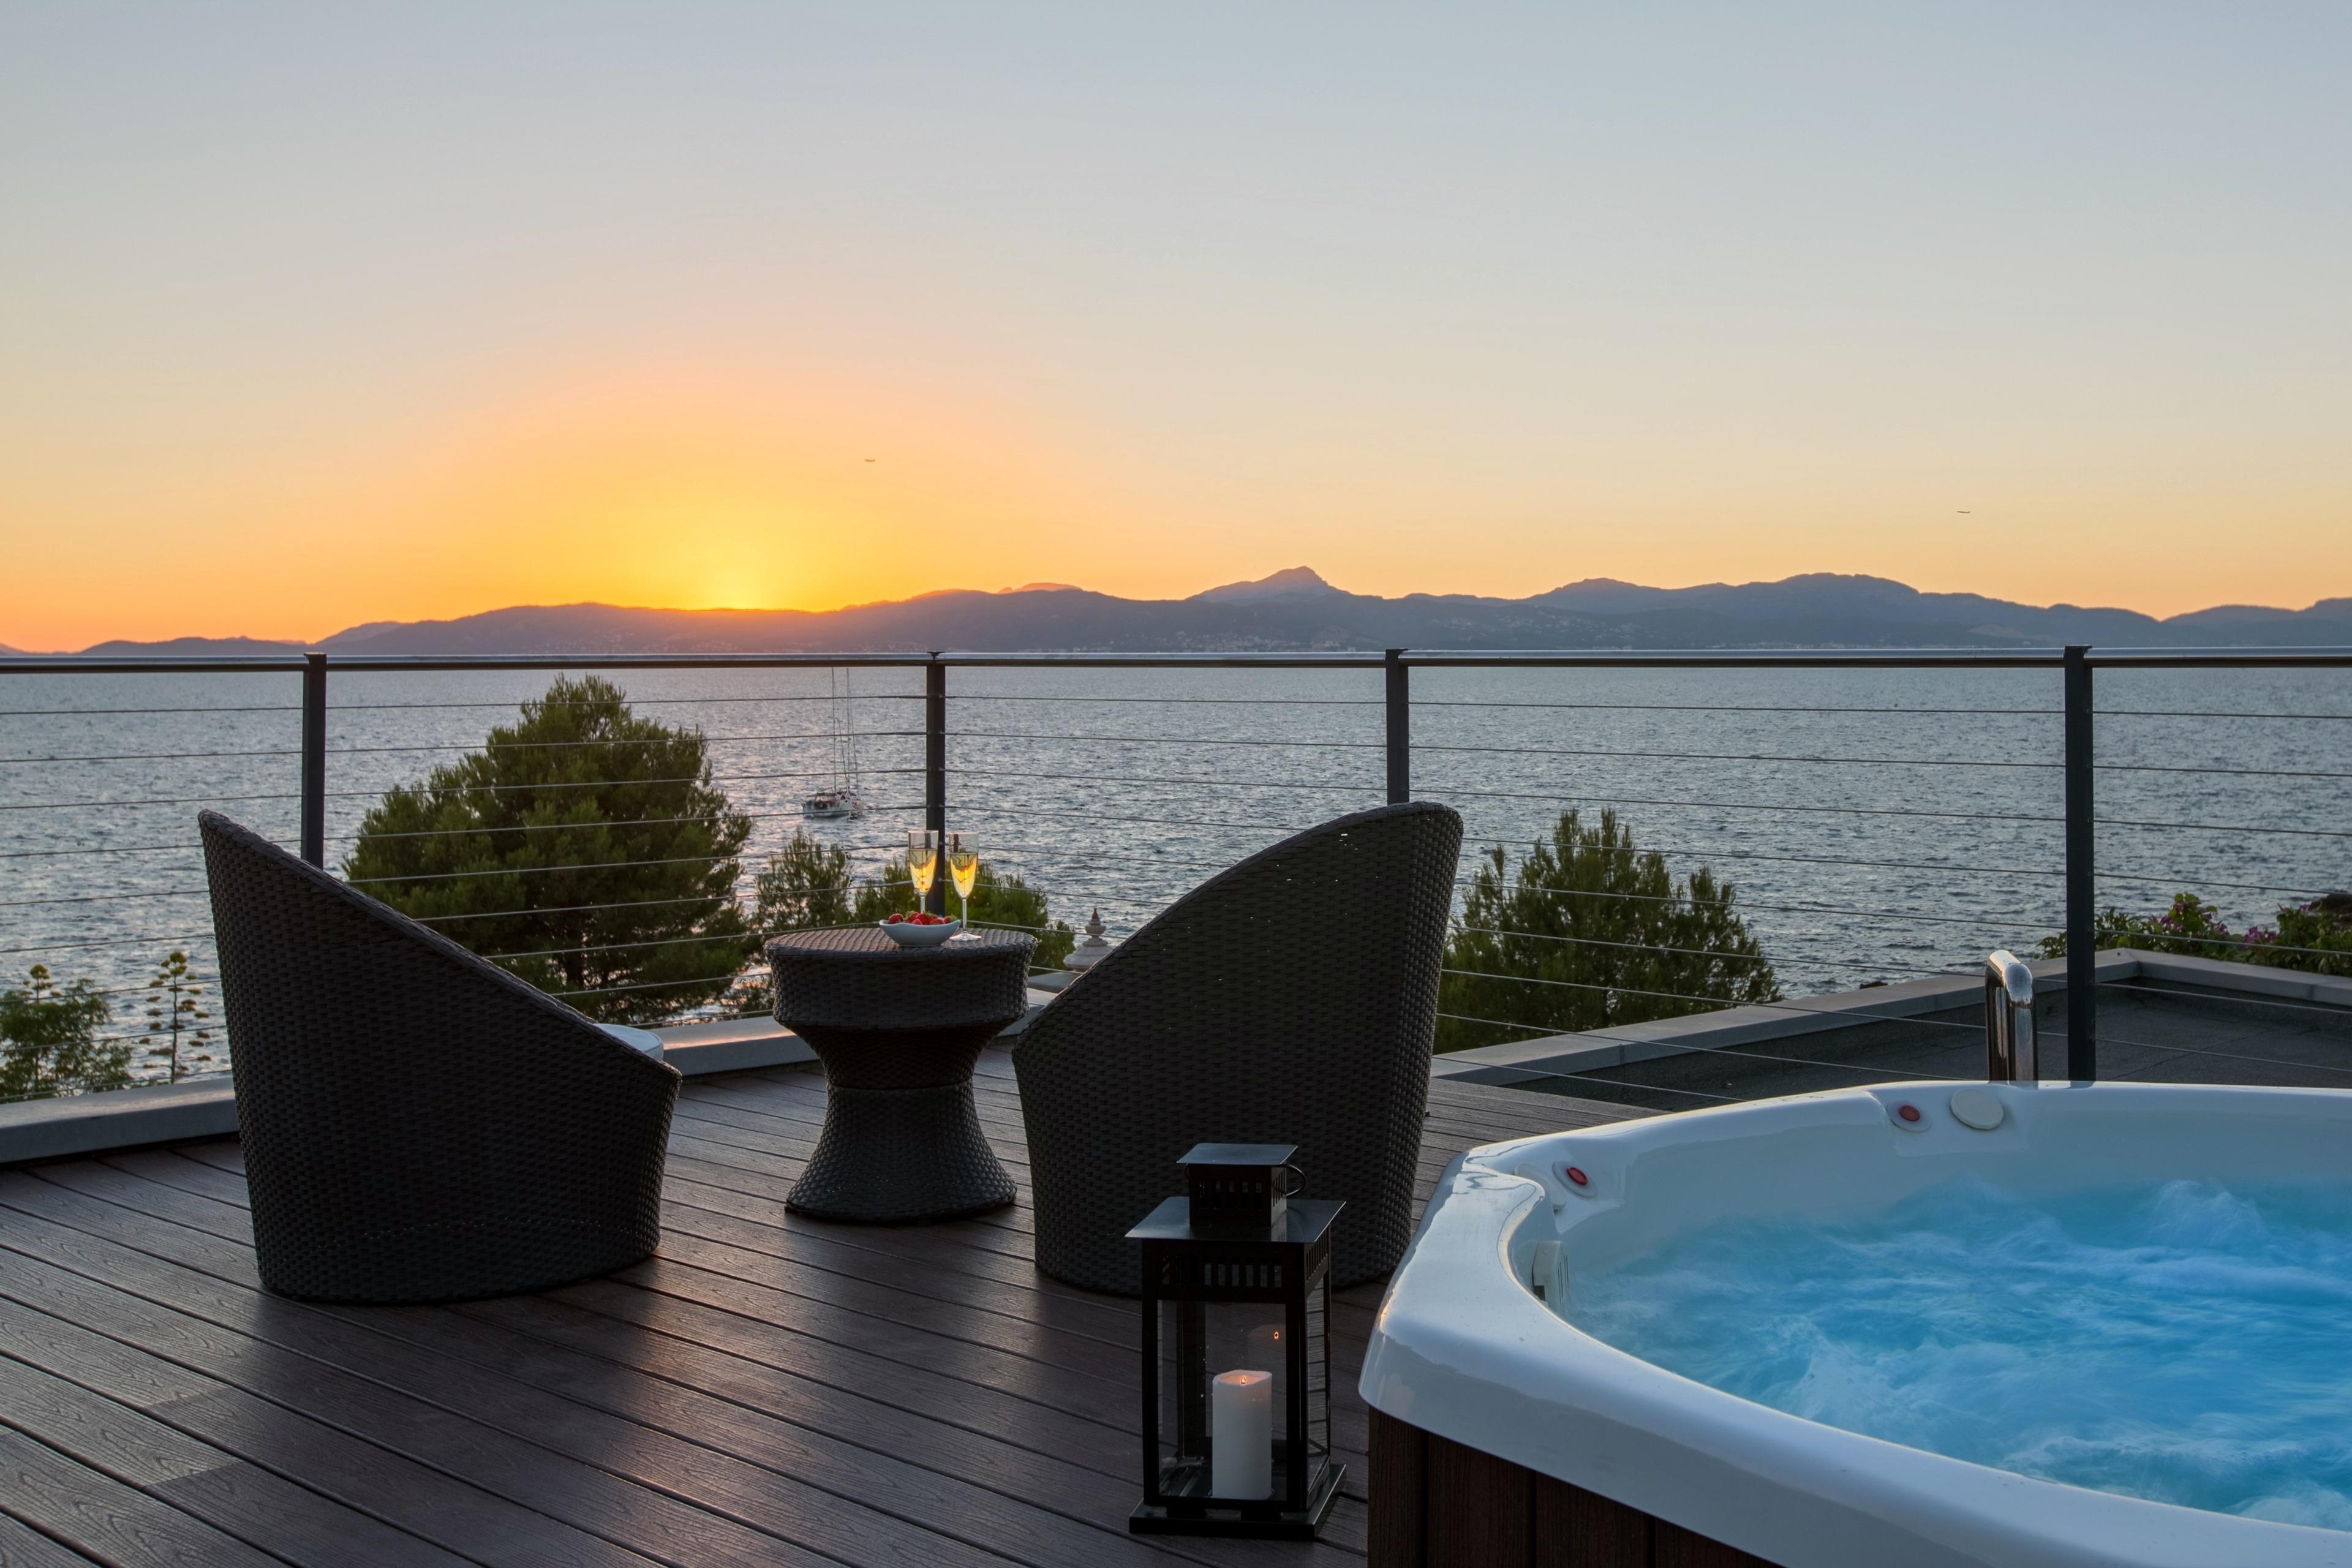 Casa Pura Luxuriöses Ferienhaus mit Meerblick